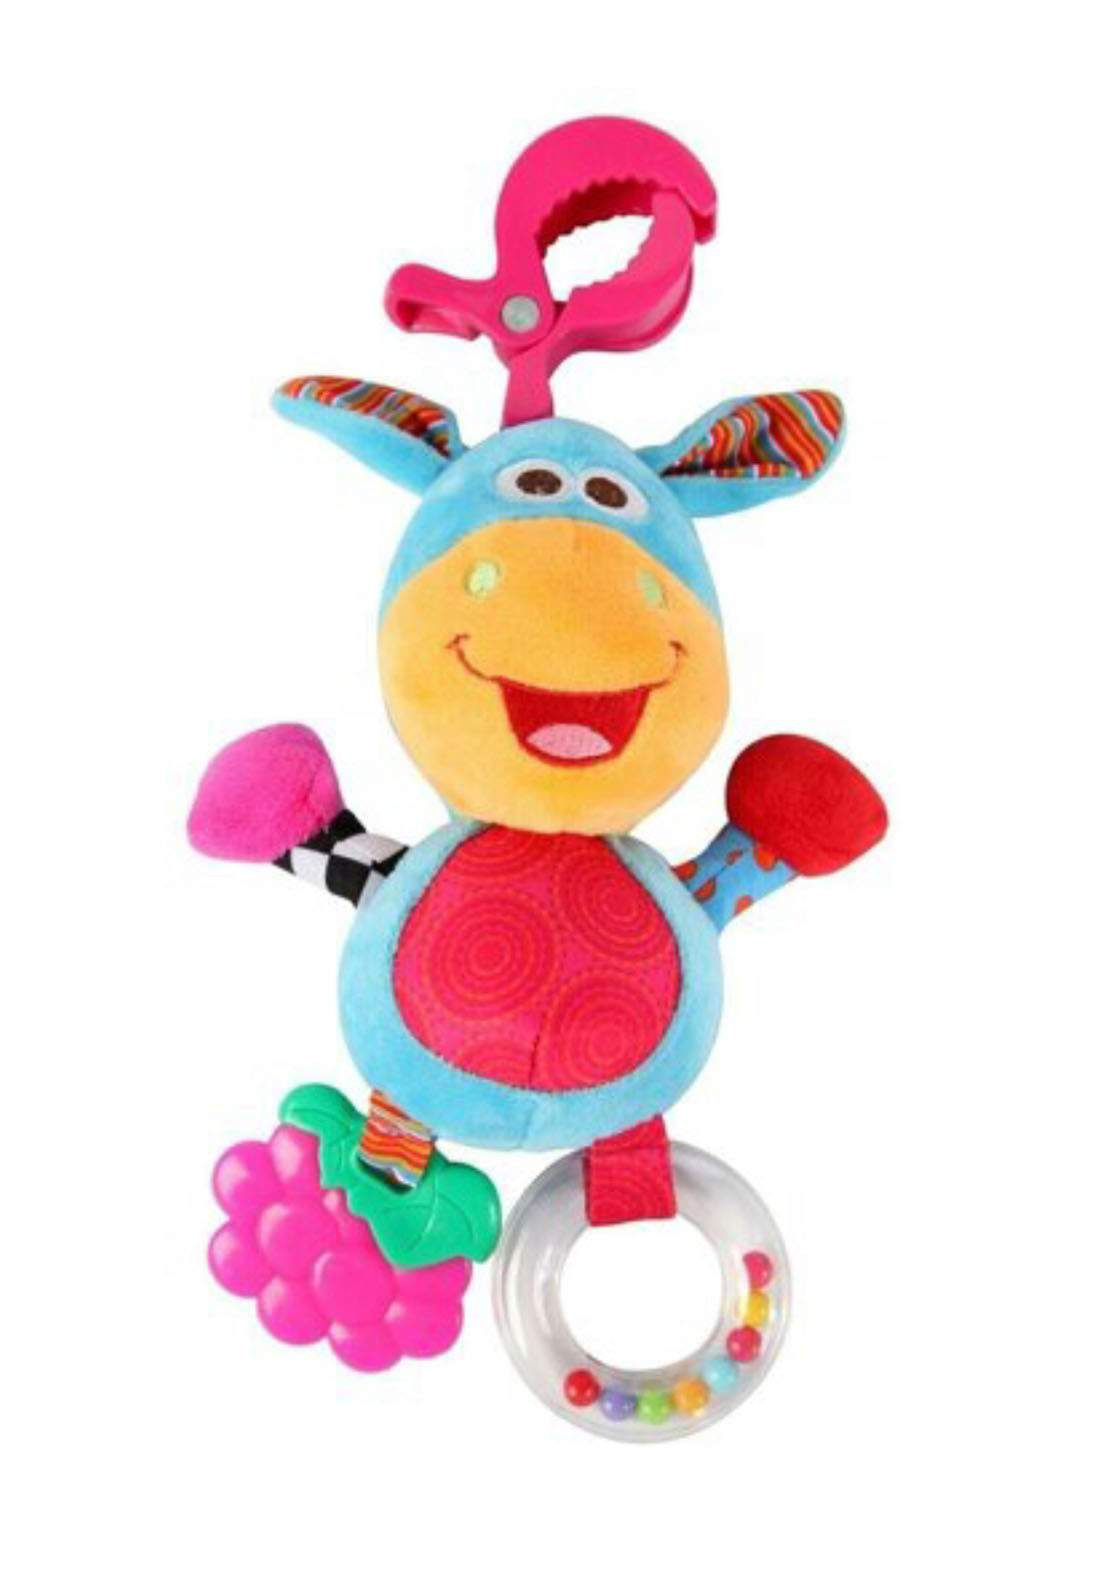 Bondigo Baby Laughing Flickering Friend دمية للأطفال